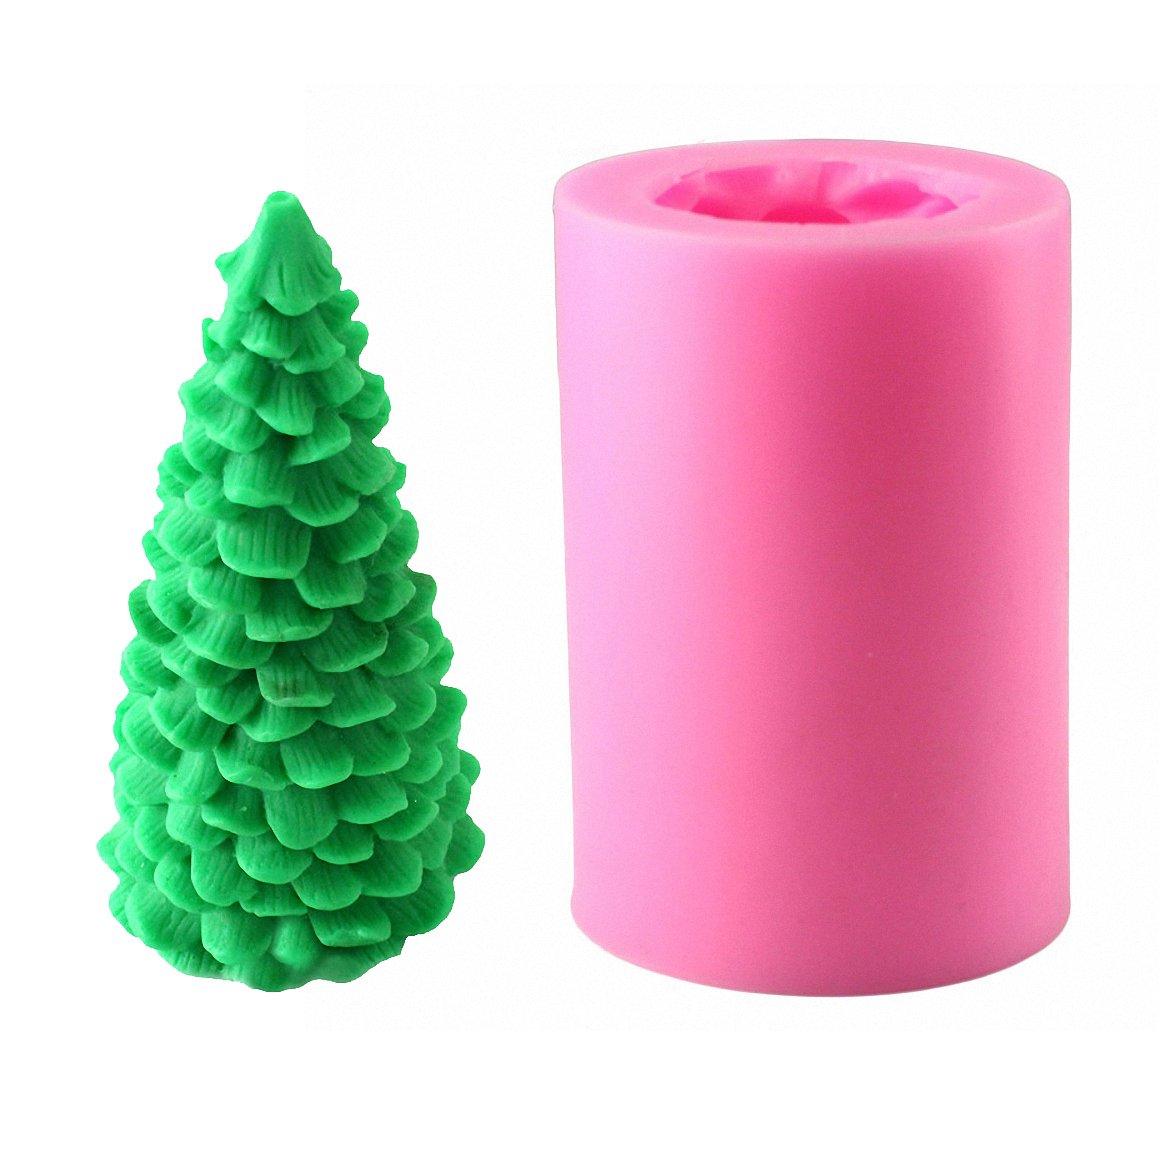 Amazon.com: 3D Christmas Tree Candle Mold - MoldFun Christmas Party ...